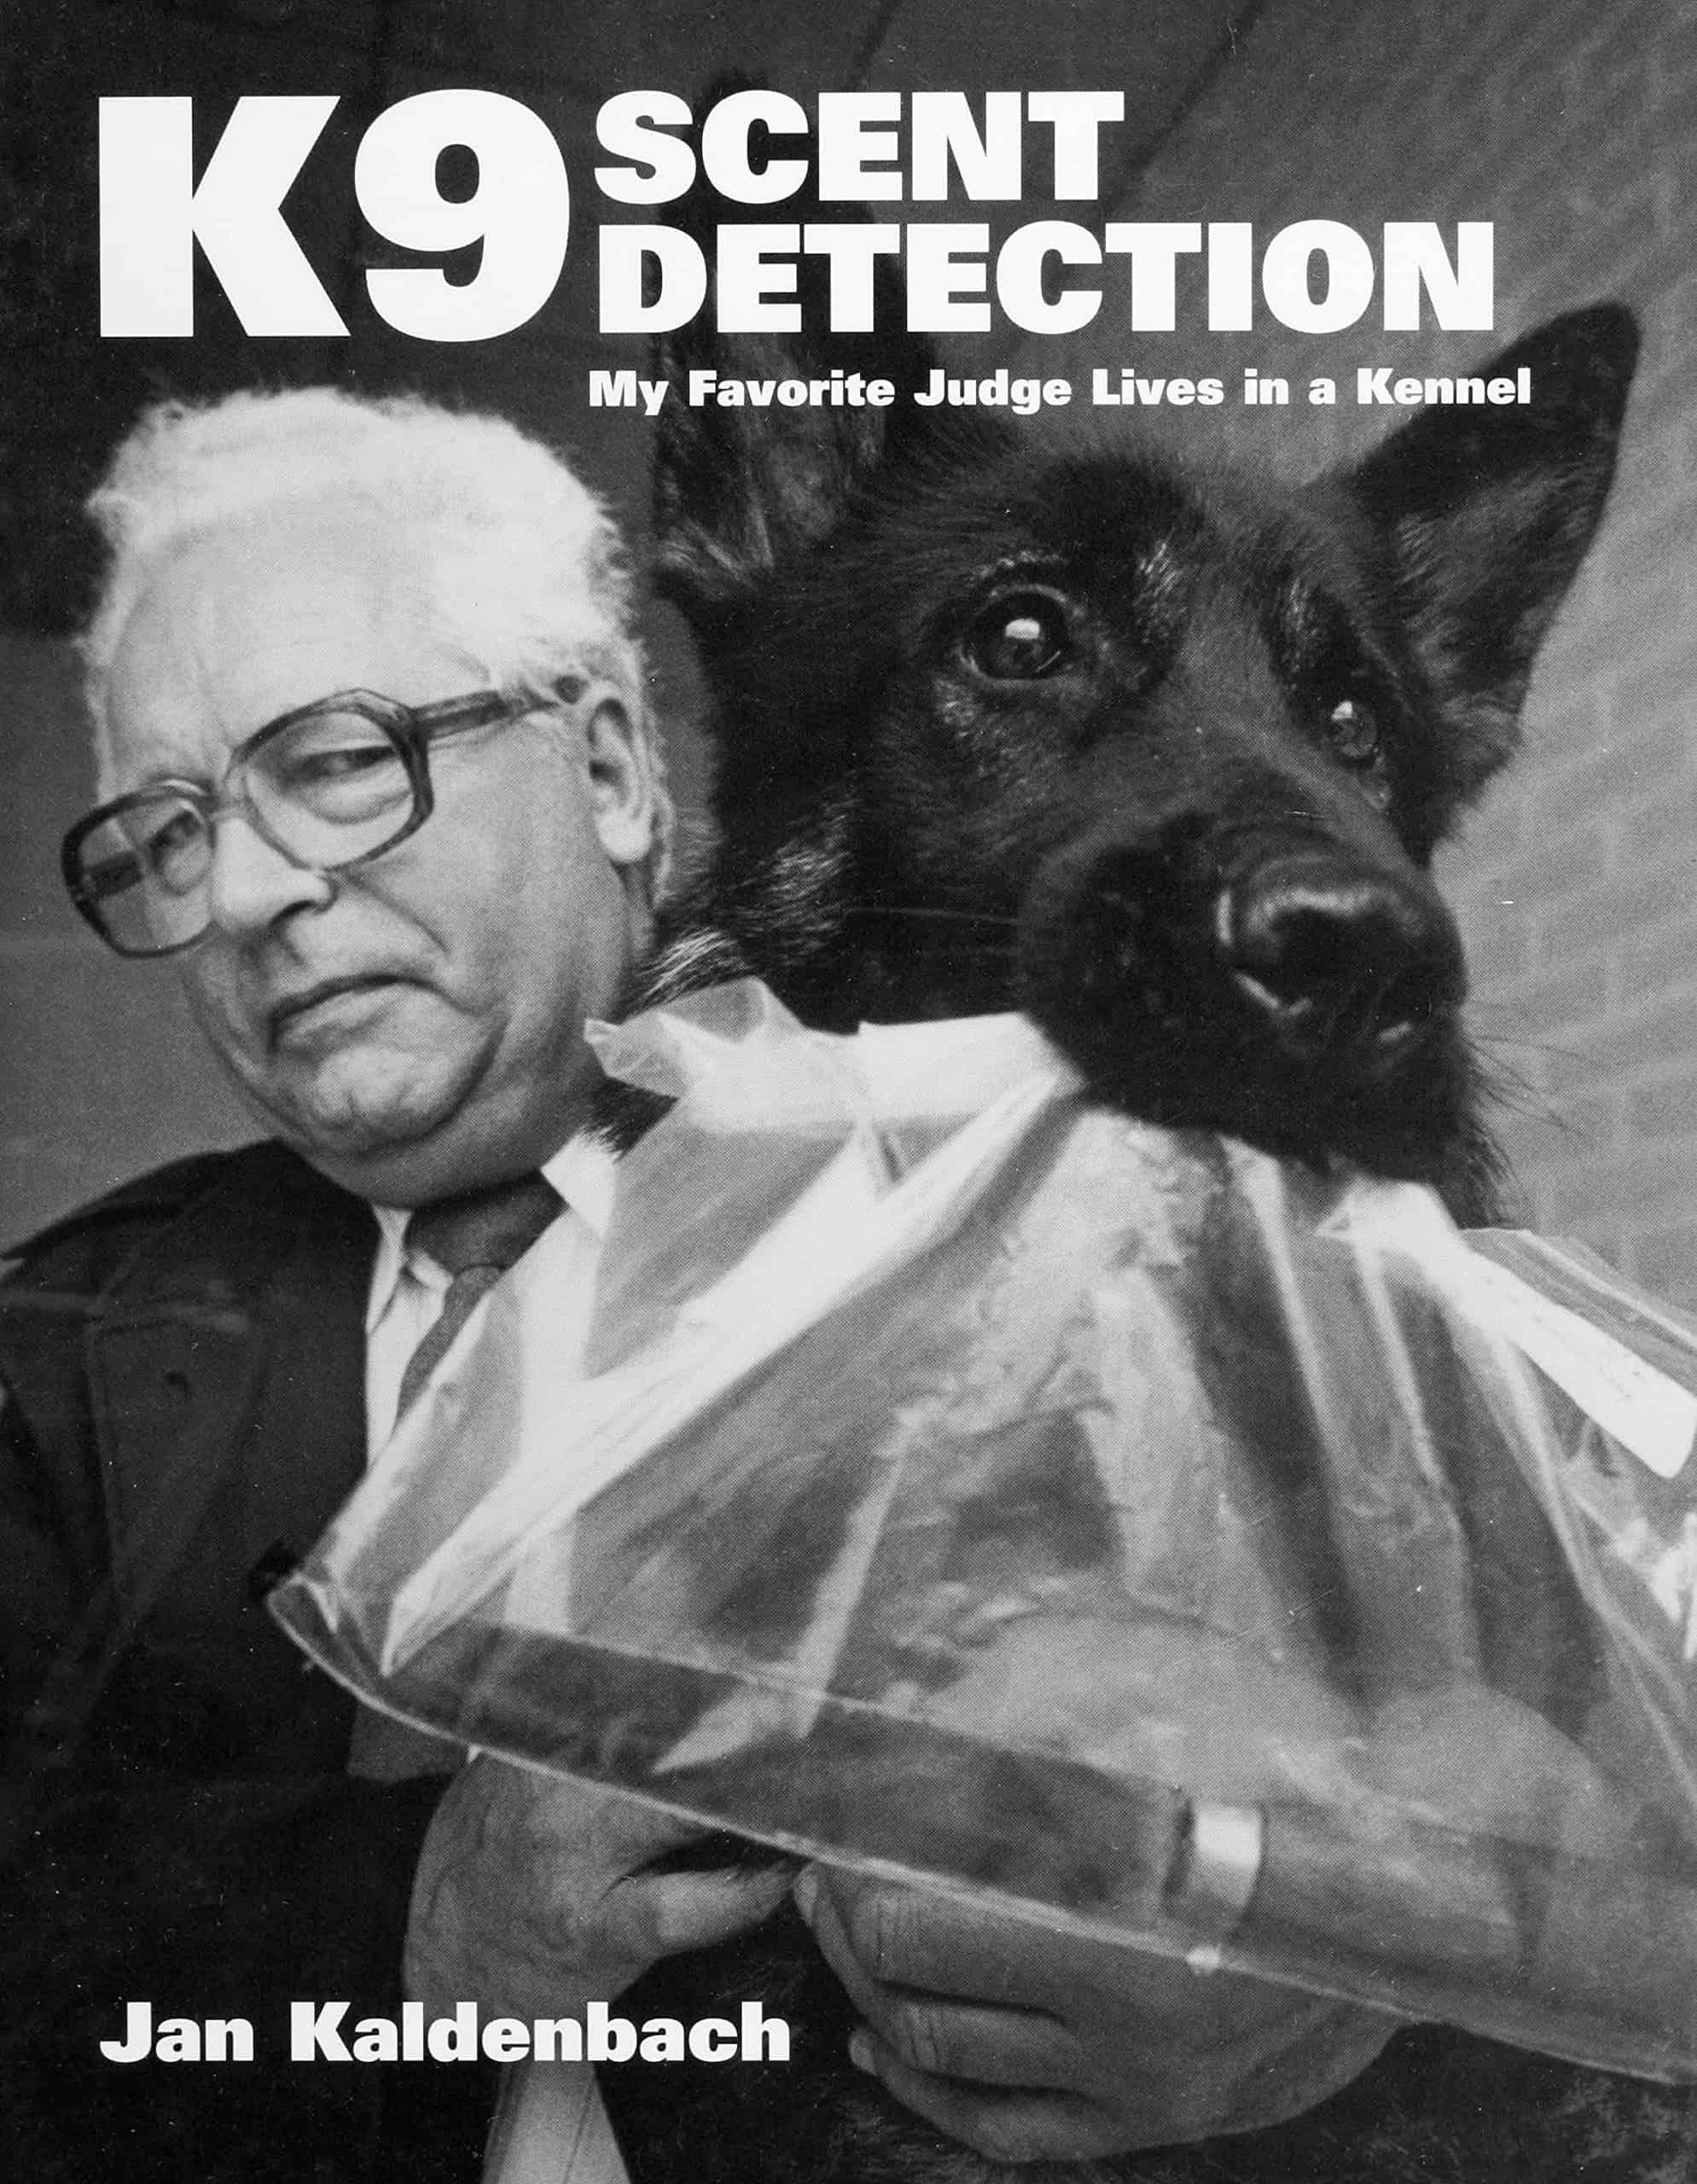 k9 scent detection jan kaldenbach